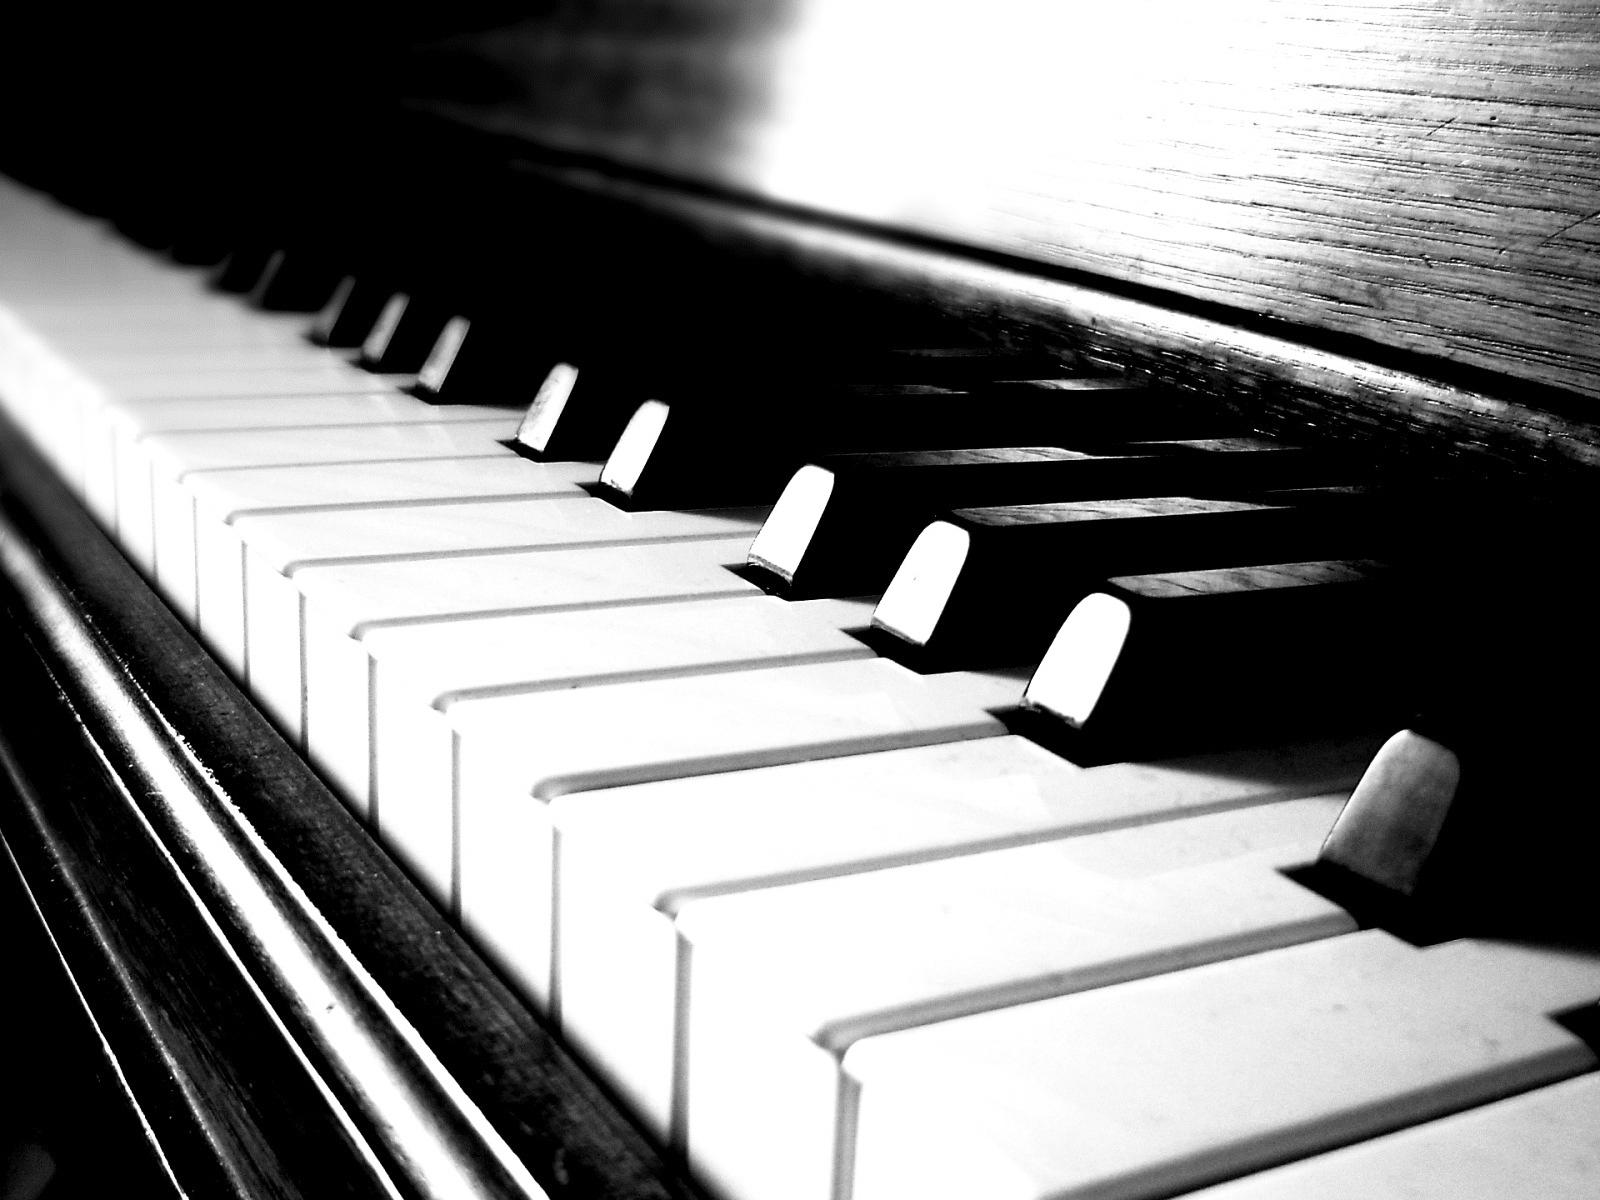 http://4.bp.blogspot.com/-_eLrktuT1iI/UGhDXggp1-I/AAAAAAAAE8c/c-P2-5tUUxQ/s1600/Piano-Keyboard-Close-Up-Black-and-White-Psupero-HD-Wallpaper--Vvallpaper.Net.jpg